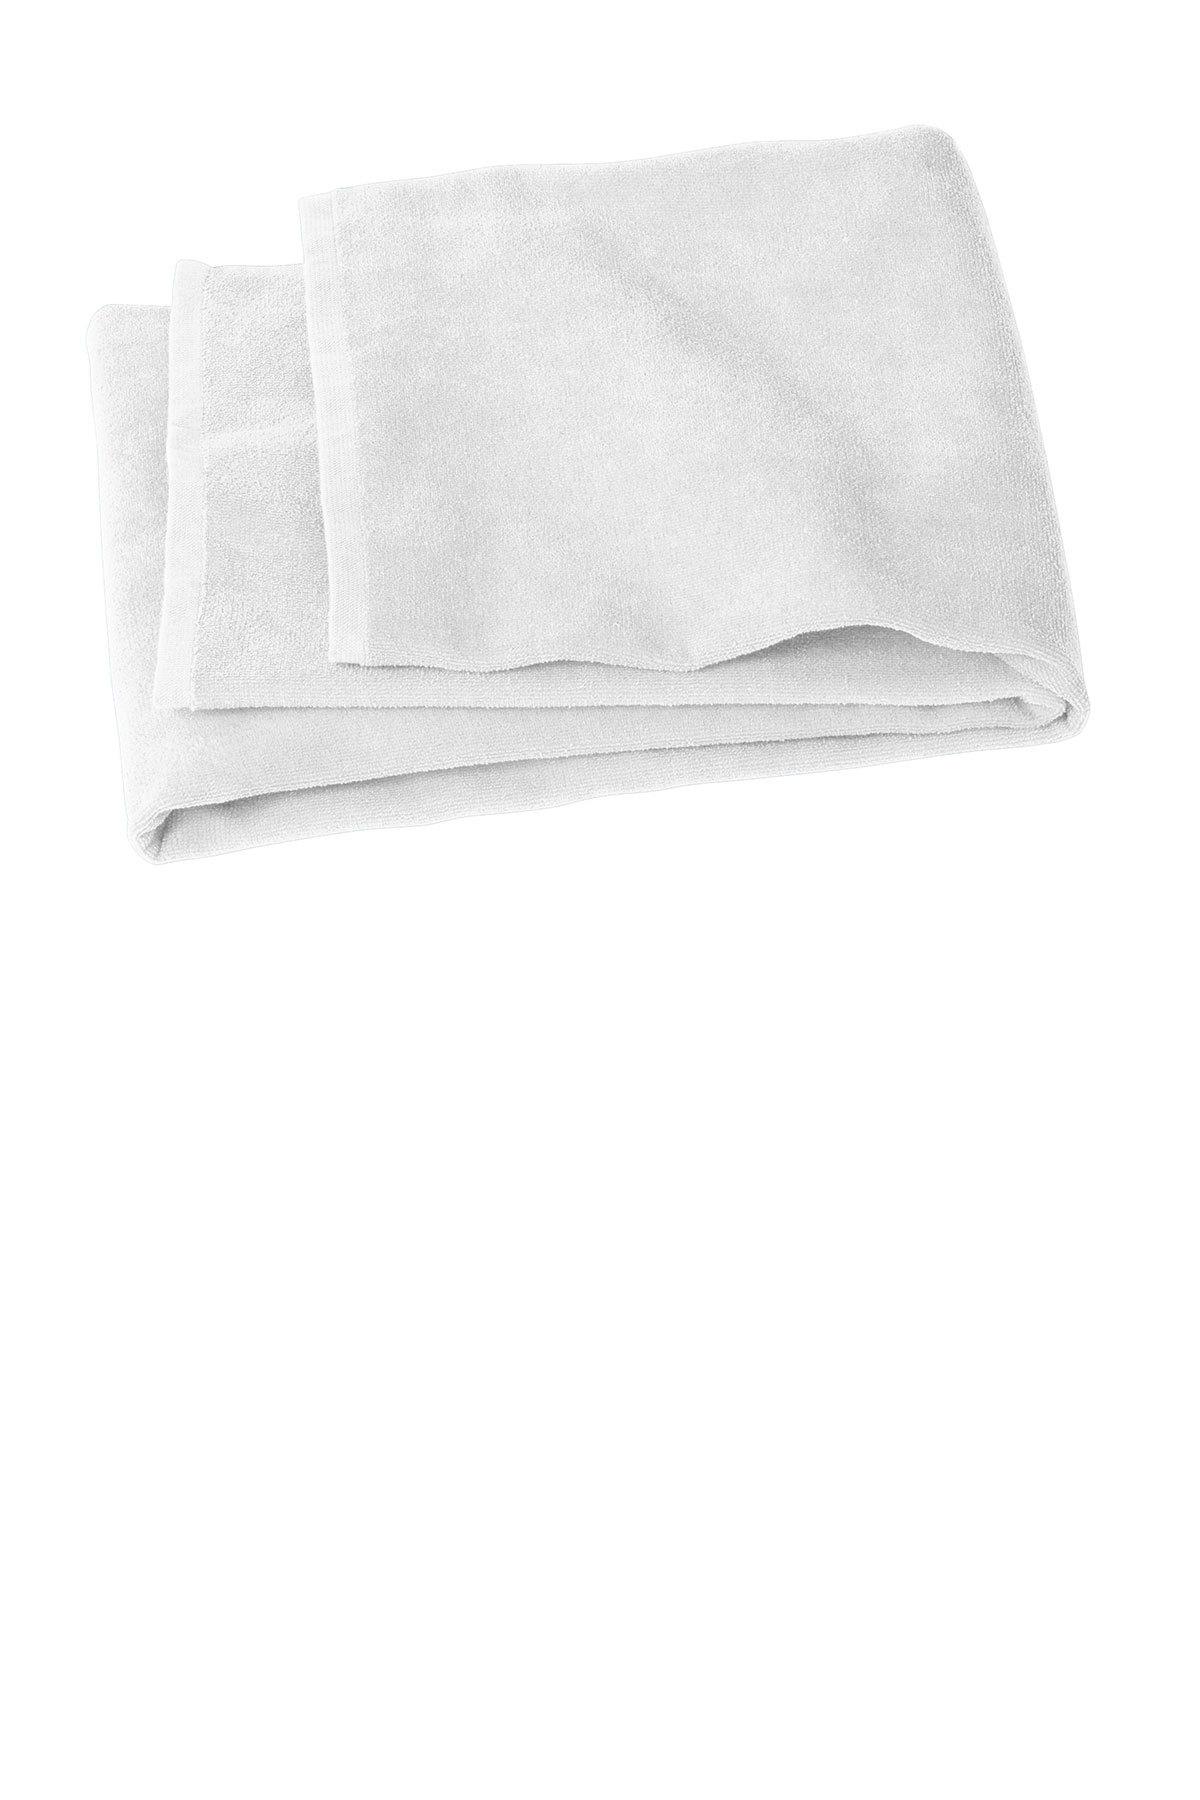 Port Authority PT44 - Value Beach Towel